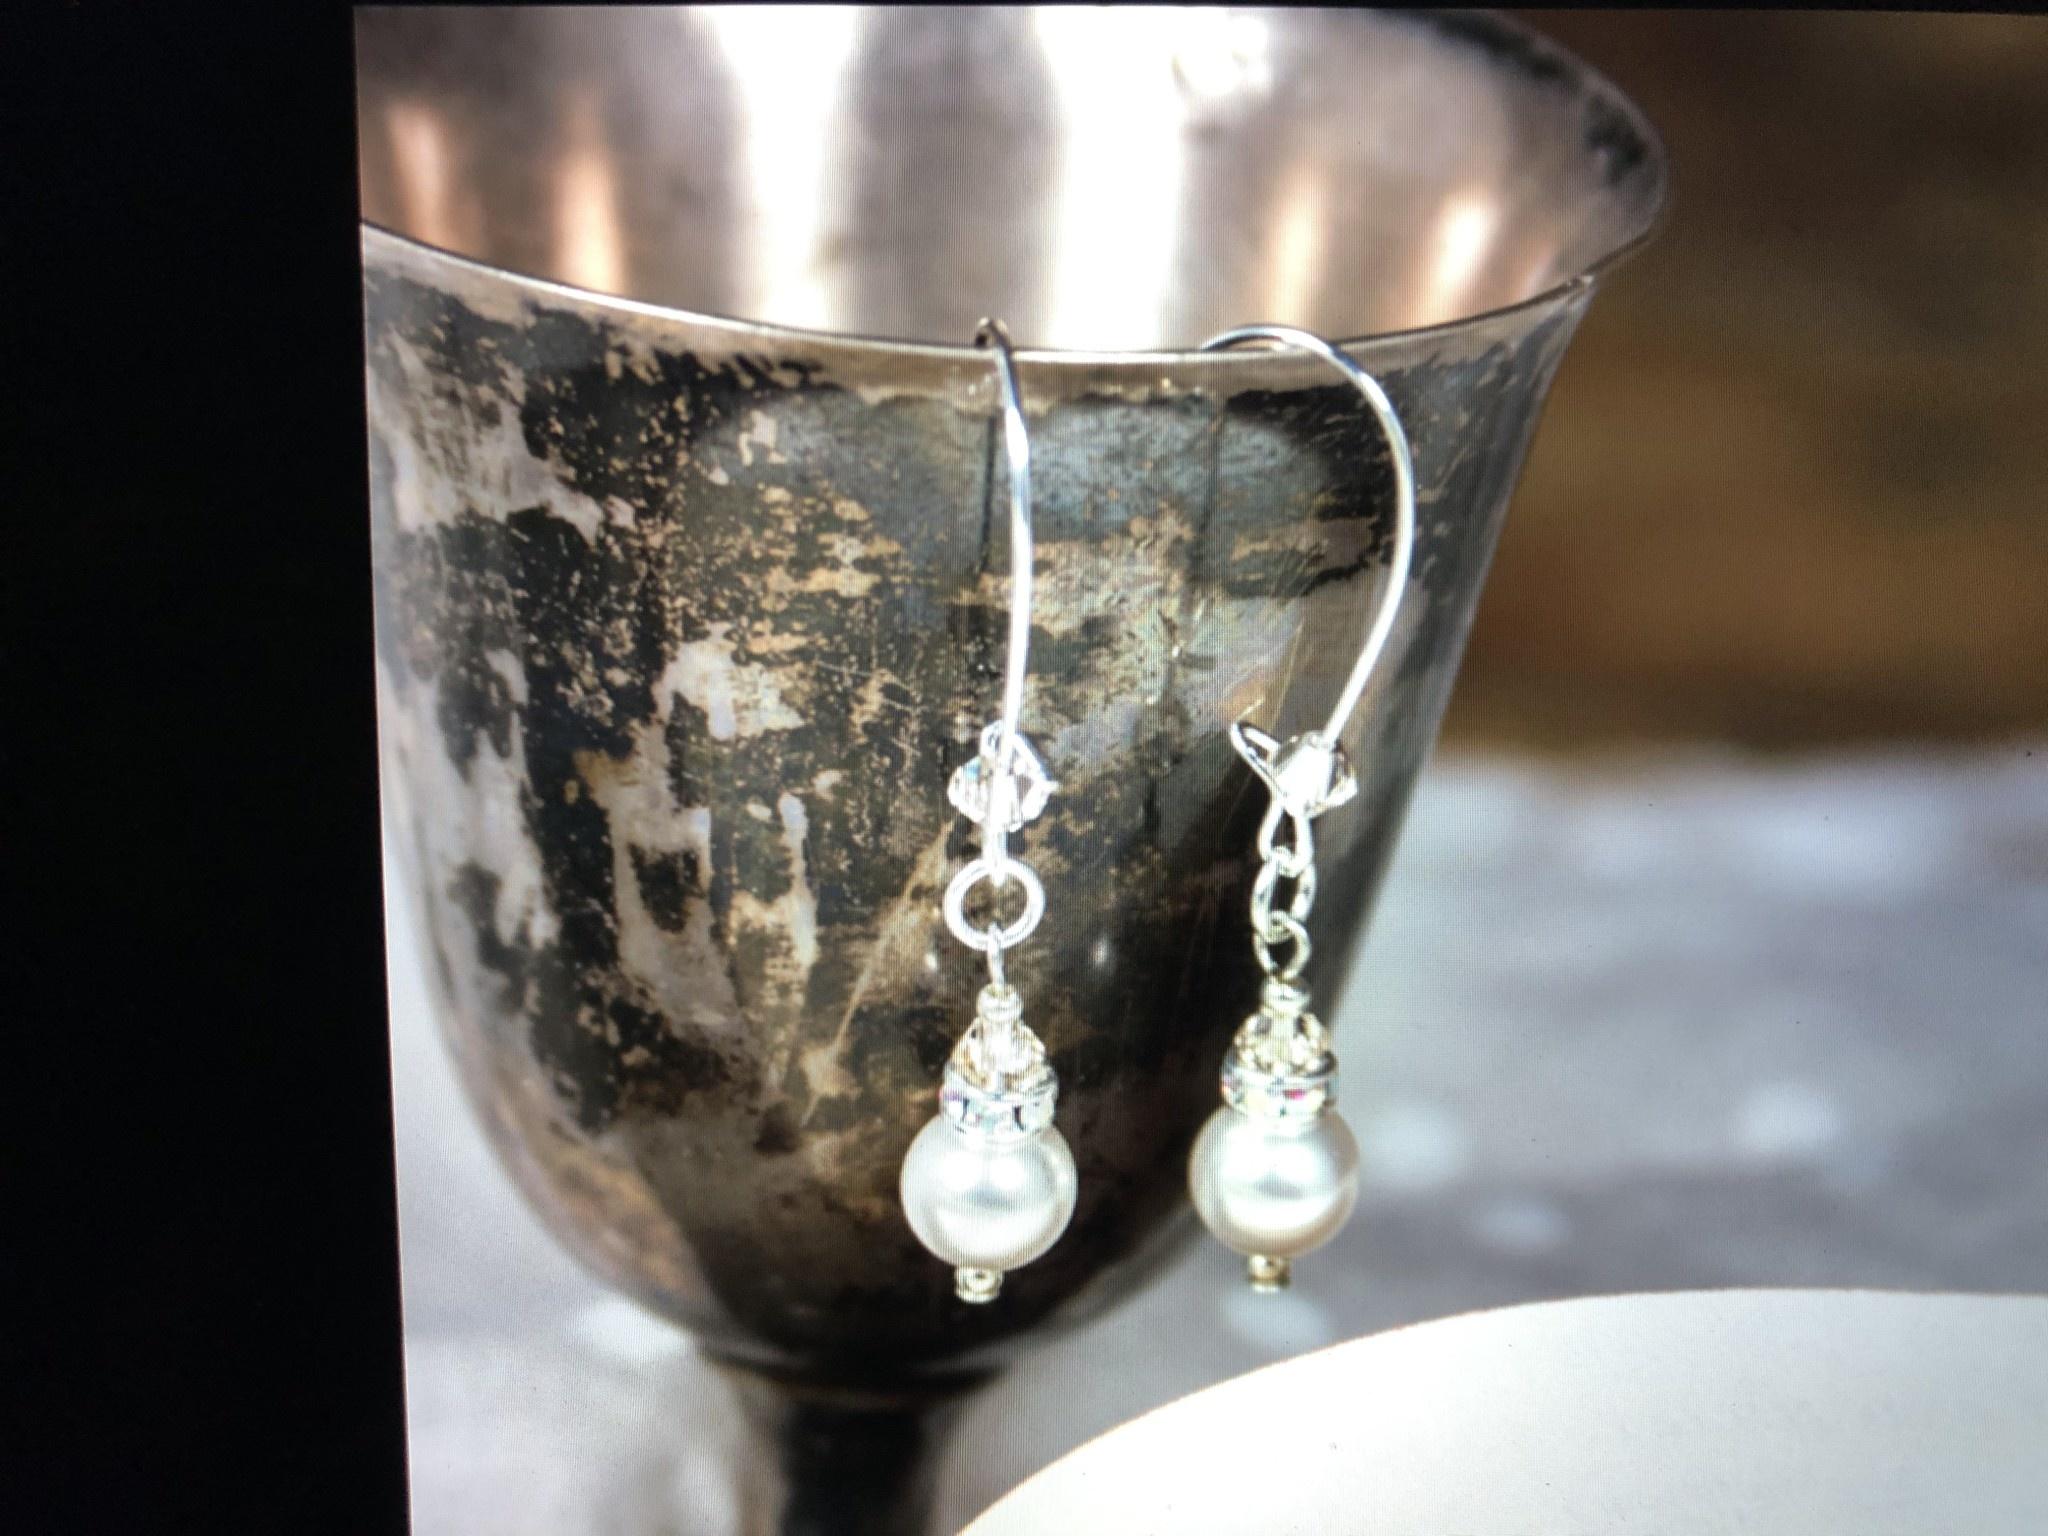 cool water jewelry EW553-182 Sanctuary Sm Kidney w/Swarovski Pearl & Iridescent Rondell